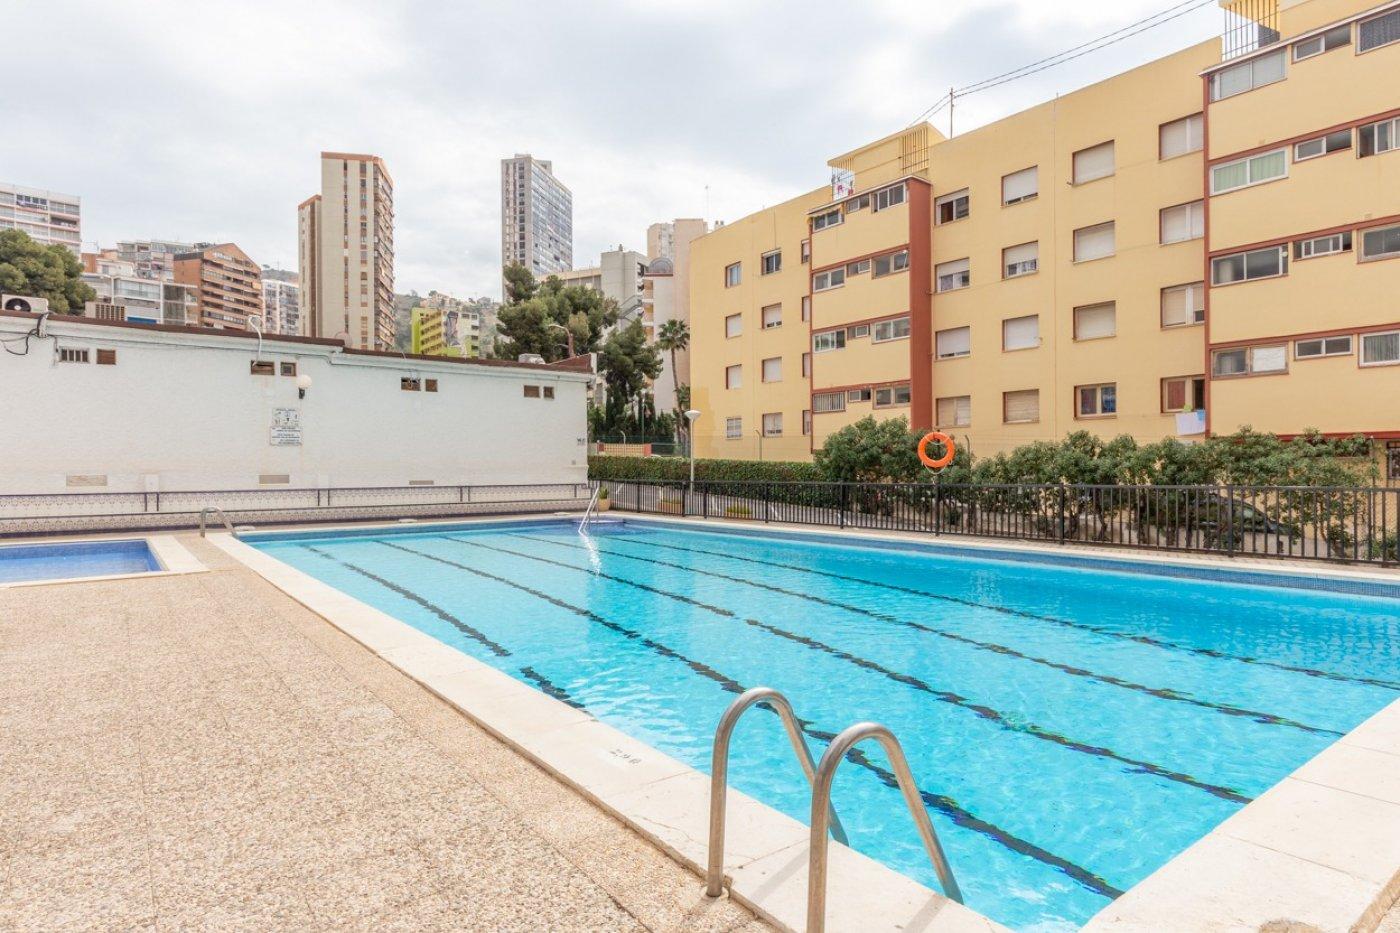 Apartamento en Benidorm zona Rincon de Loix de 48 m²